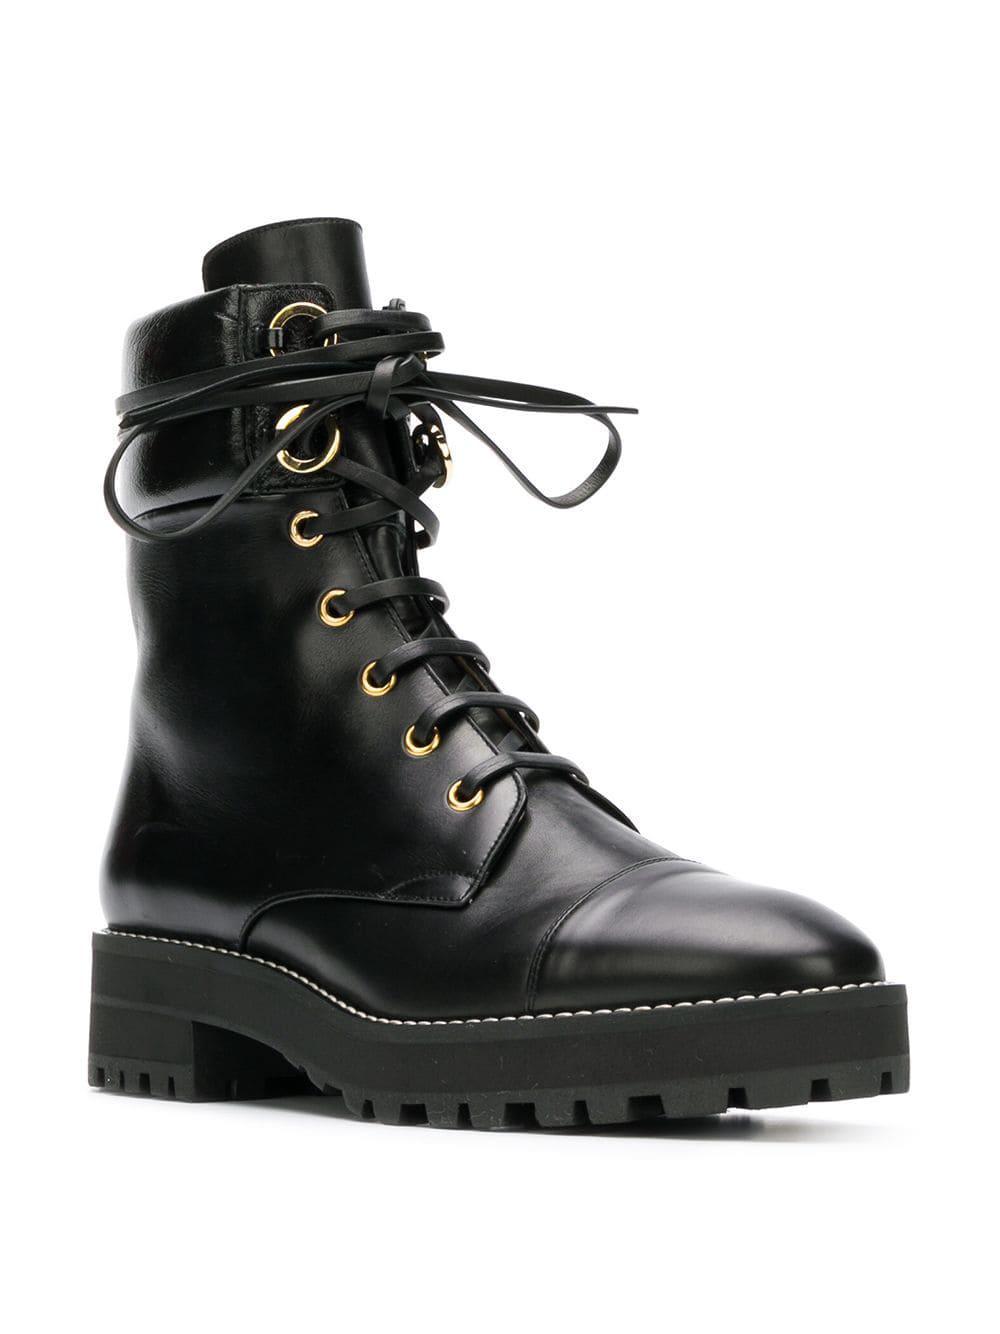 stuart weitzman women's lexy round toe leather lace up boots